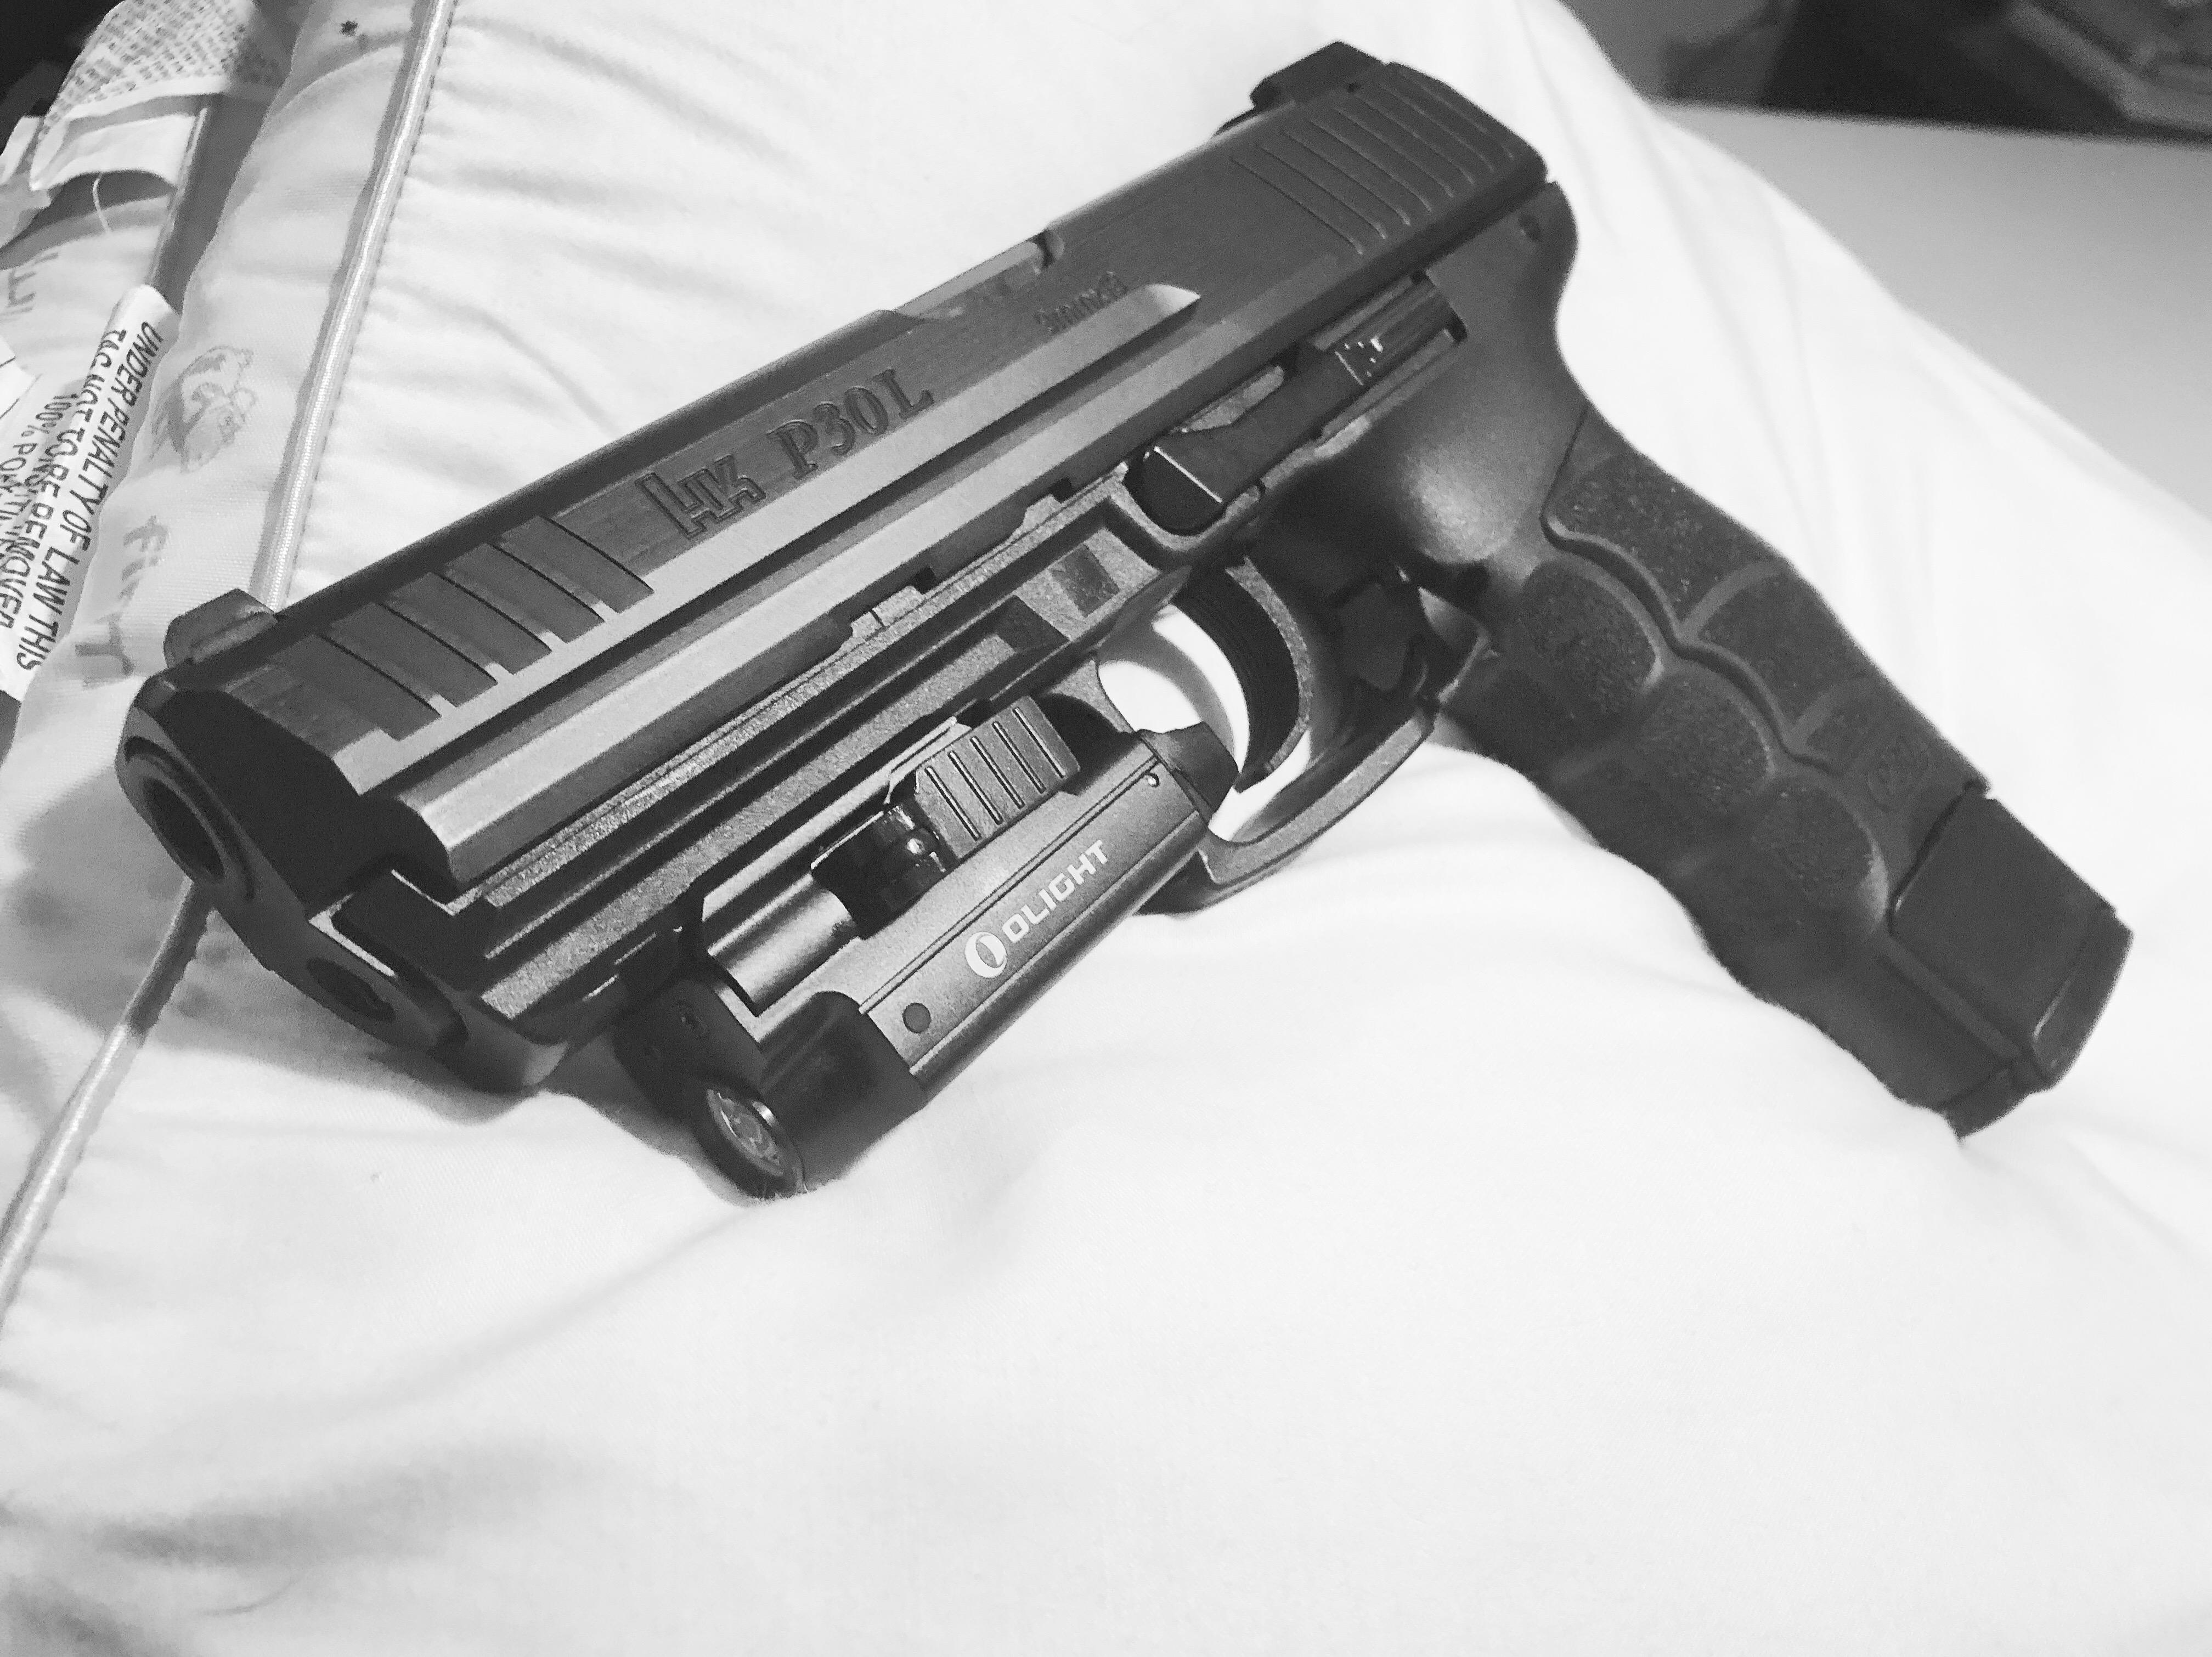 20 round/140mm P30/VP9 mags!-5486d4a1-0a1c-4712-be15-7694d9f31980_1544150969428.jpeg